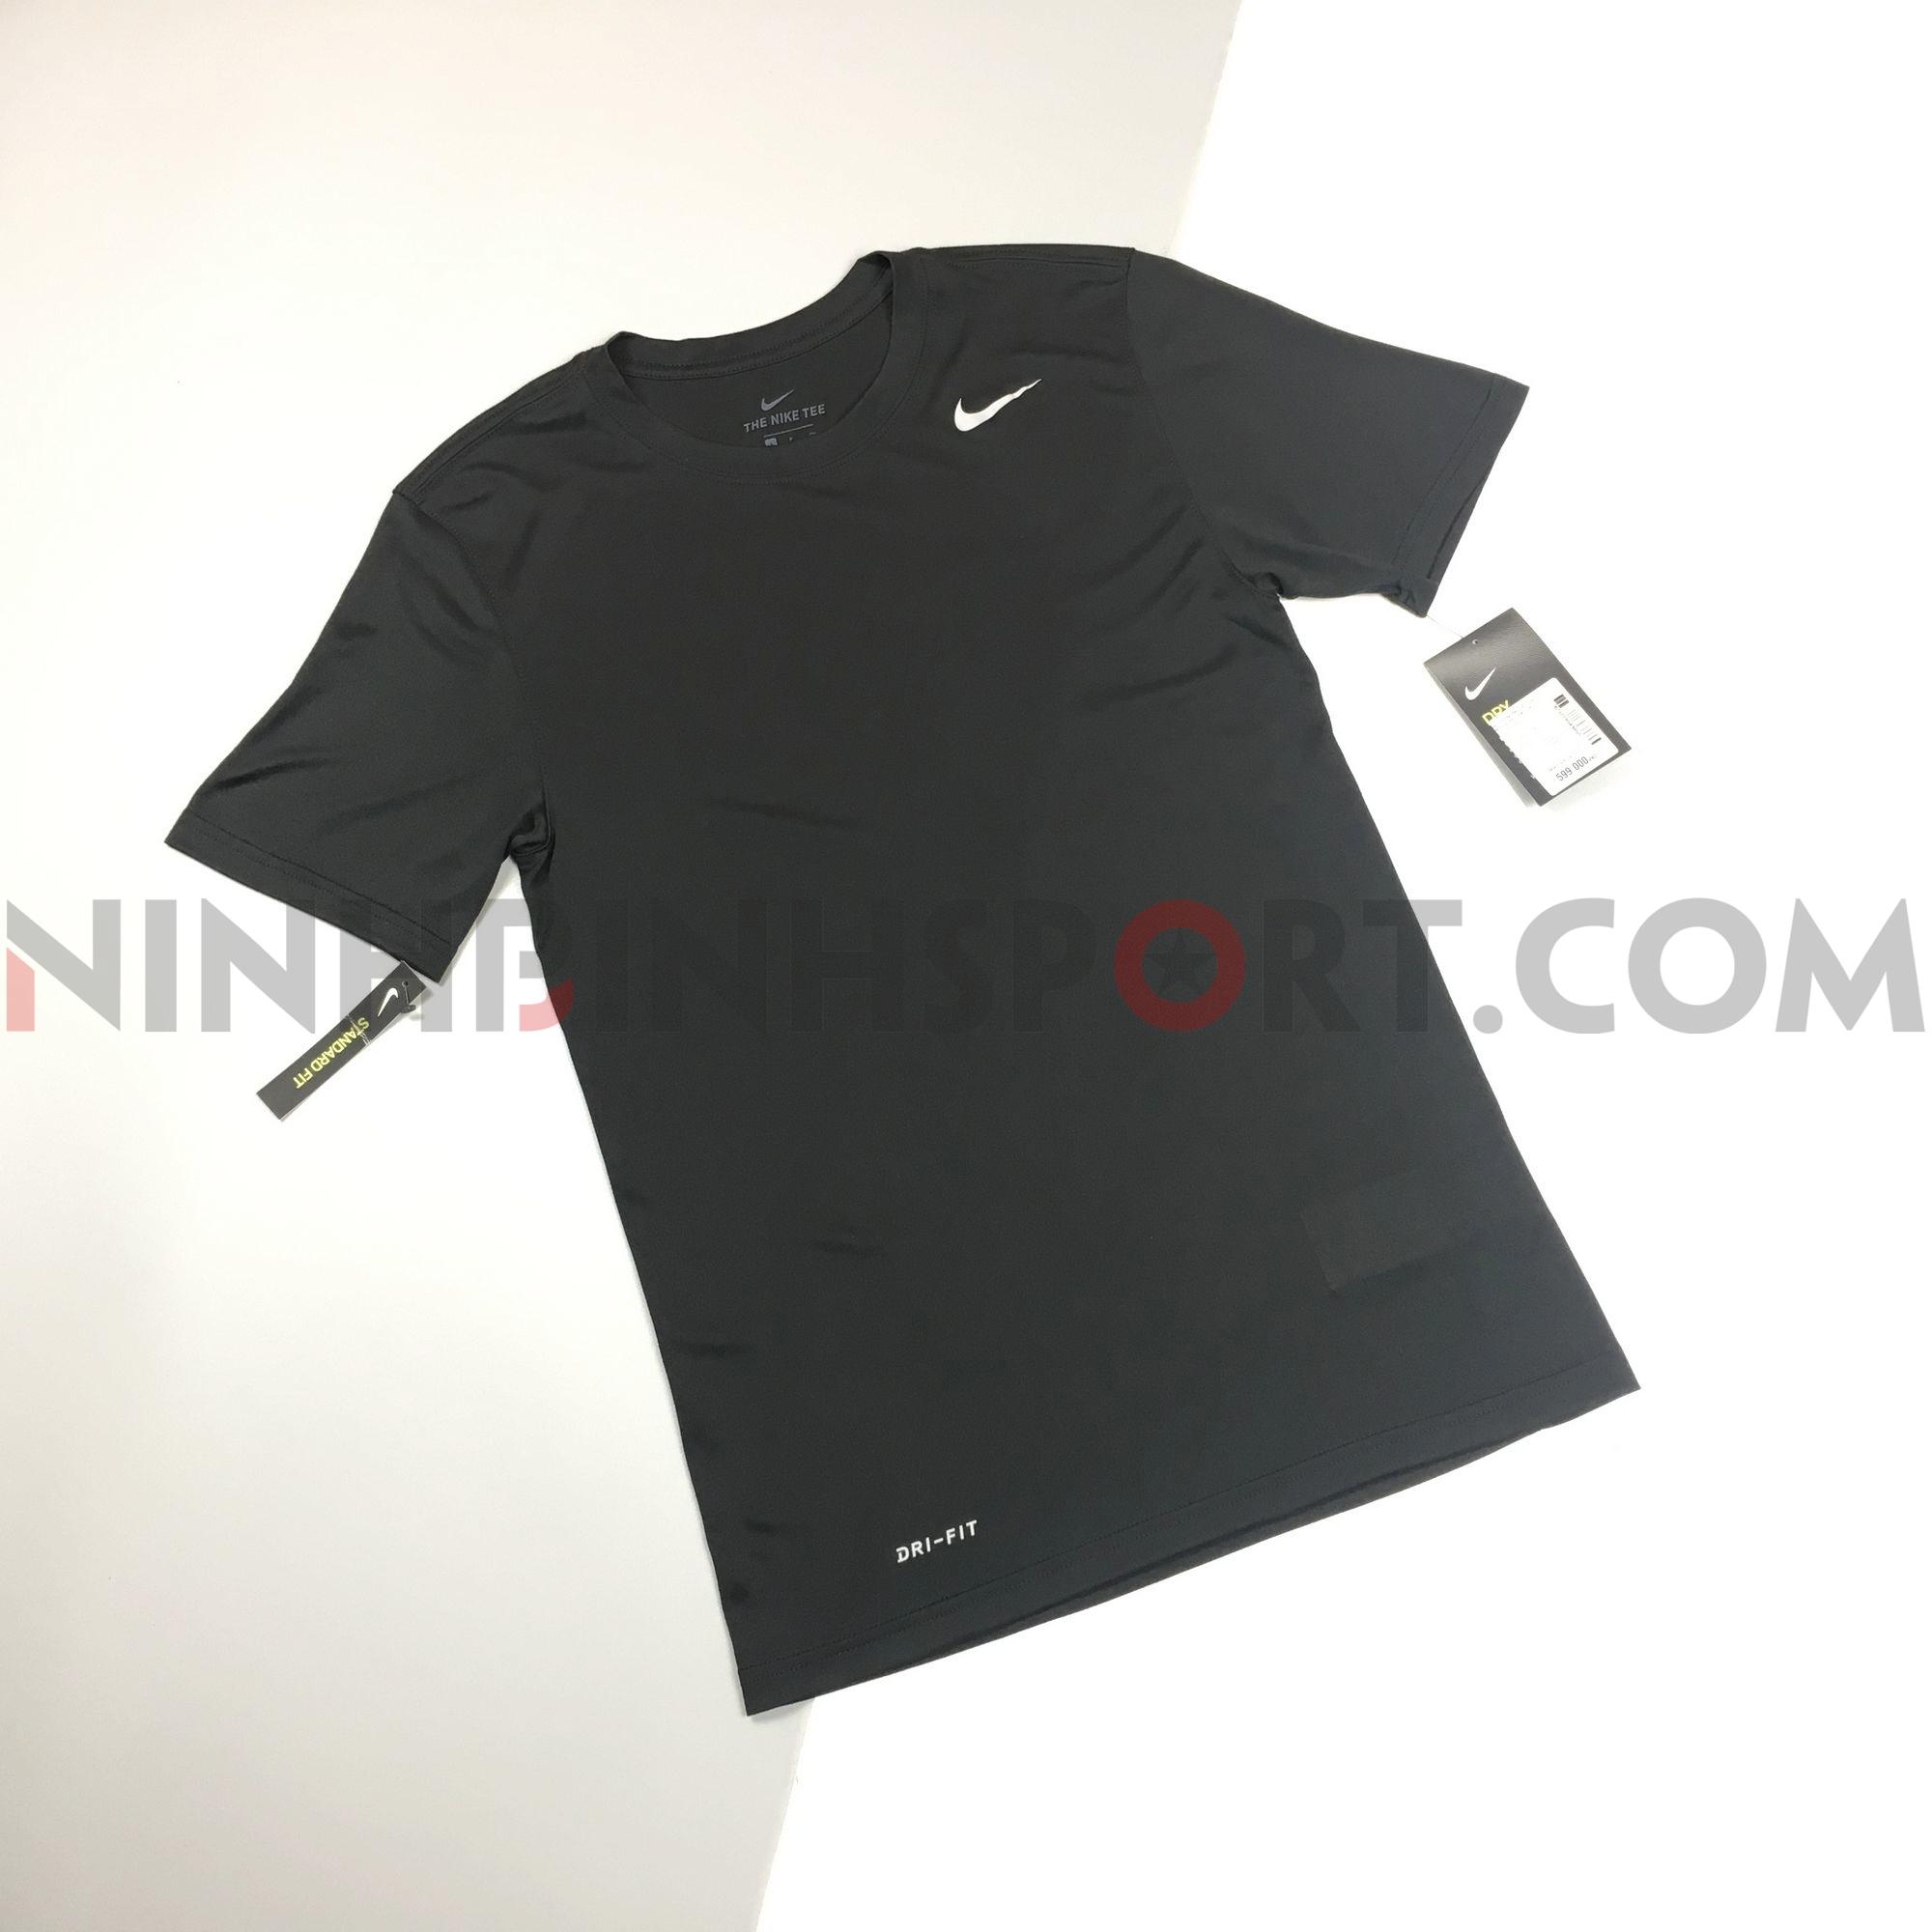 Áo thể thao nam Nike Legend 2.0 718834-010